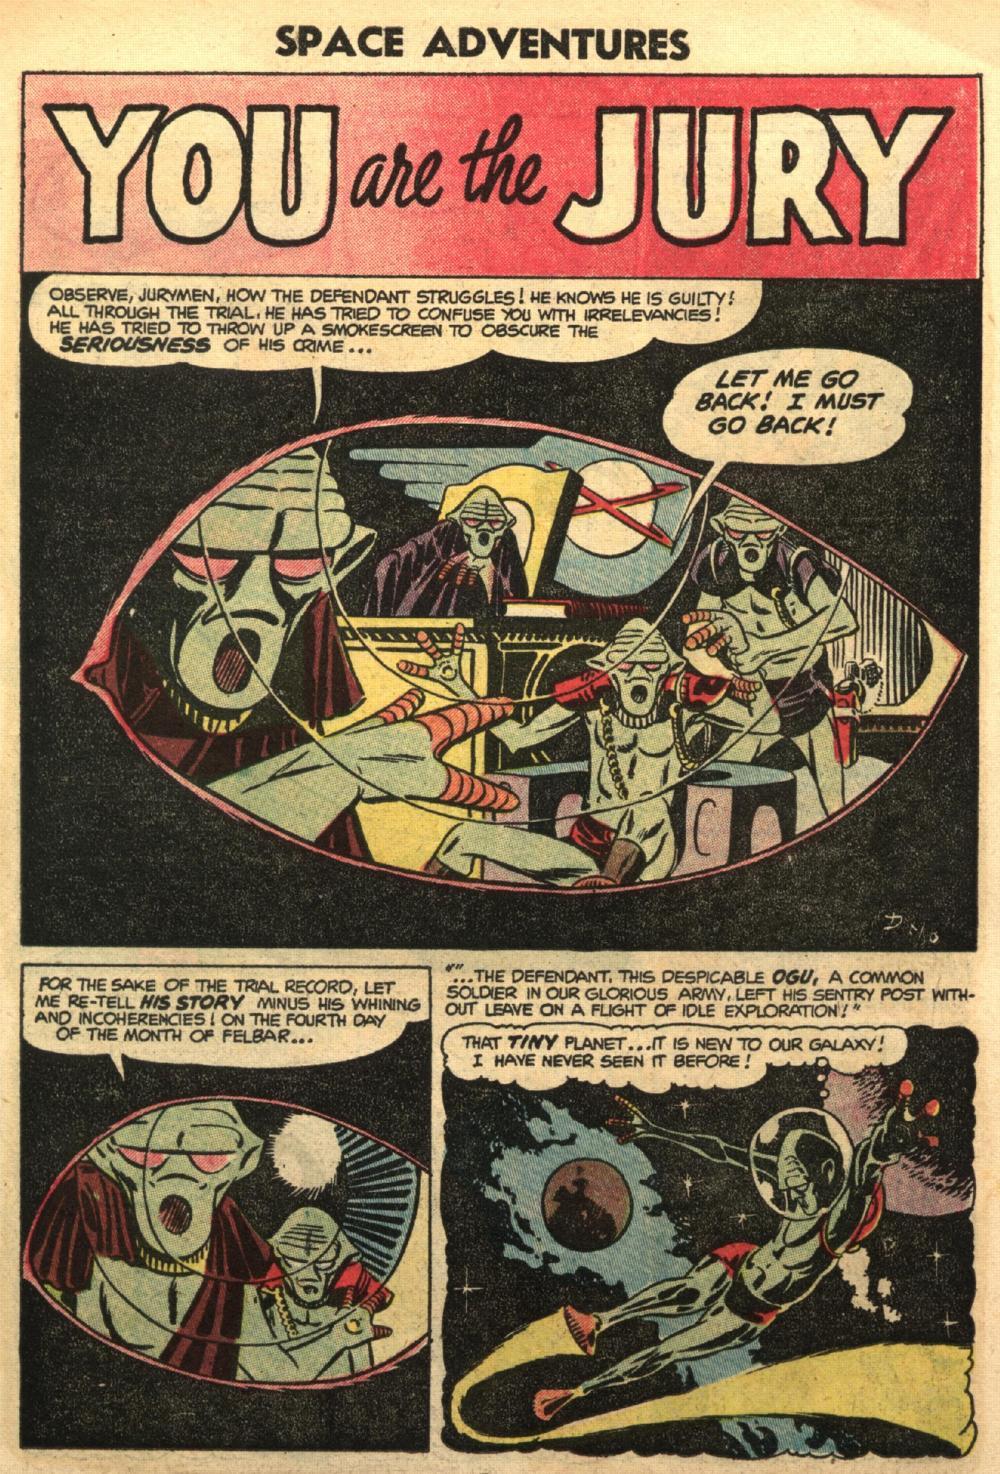 Space Adventures Vol 1 11